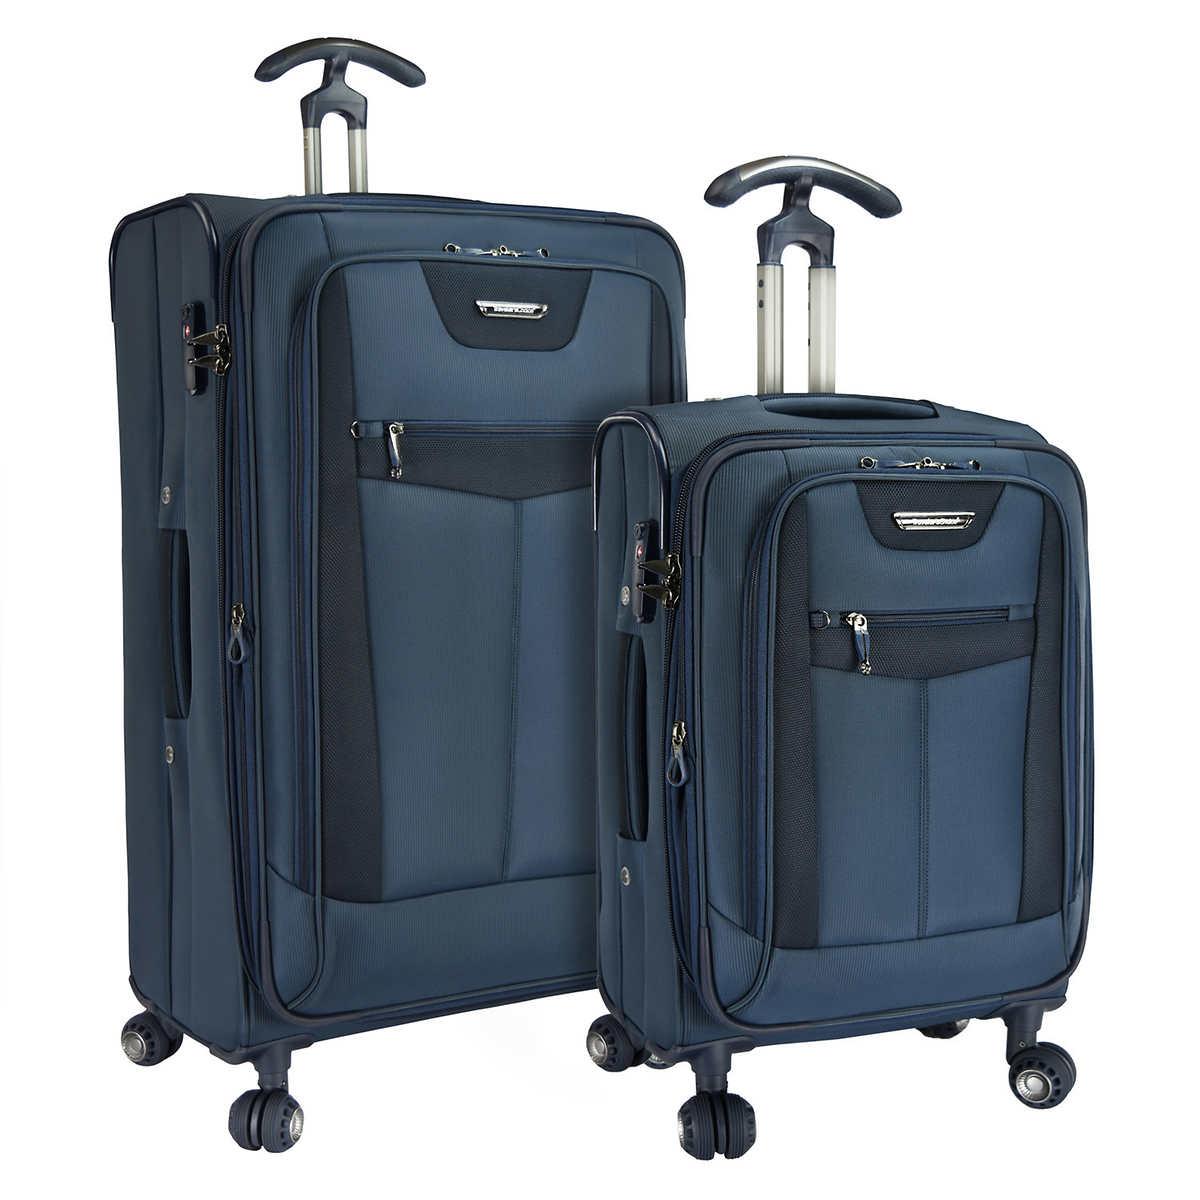 Luggage Sets | Costco